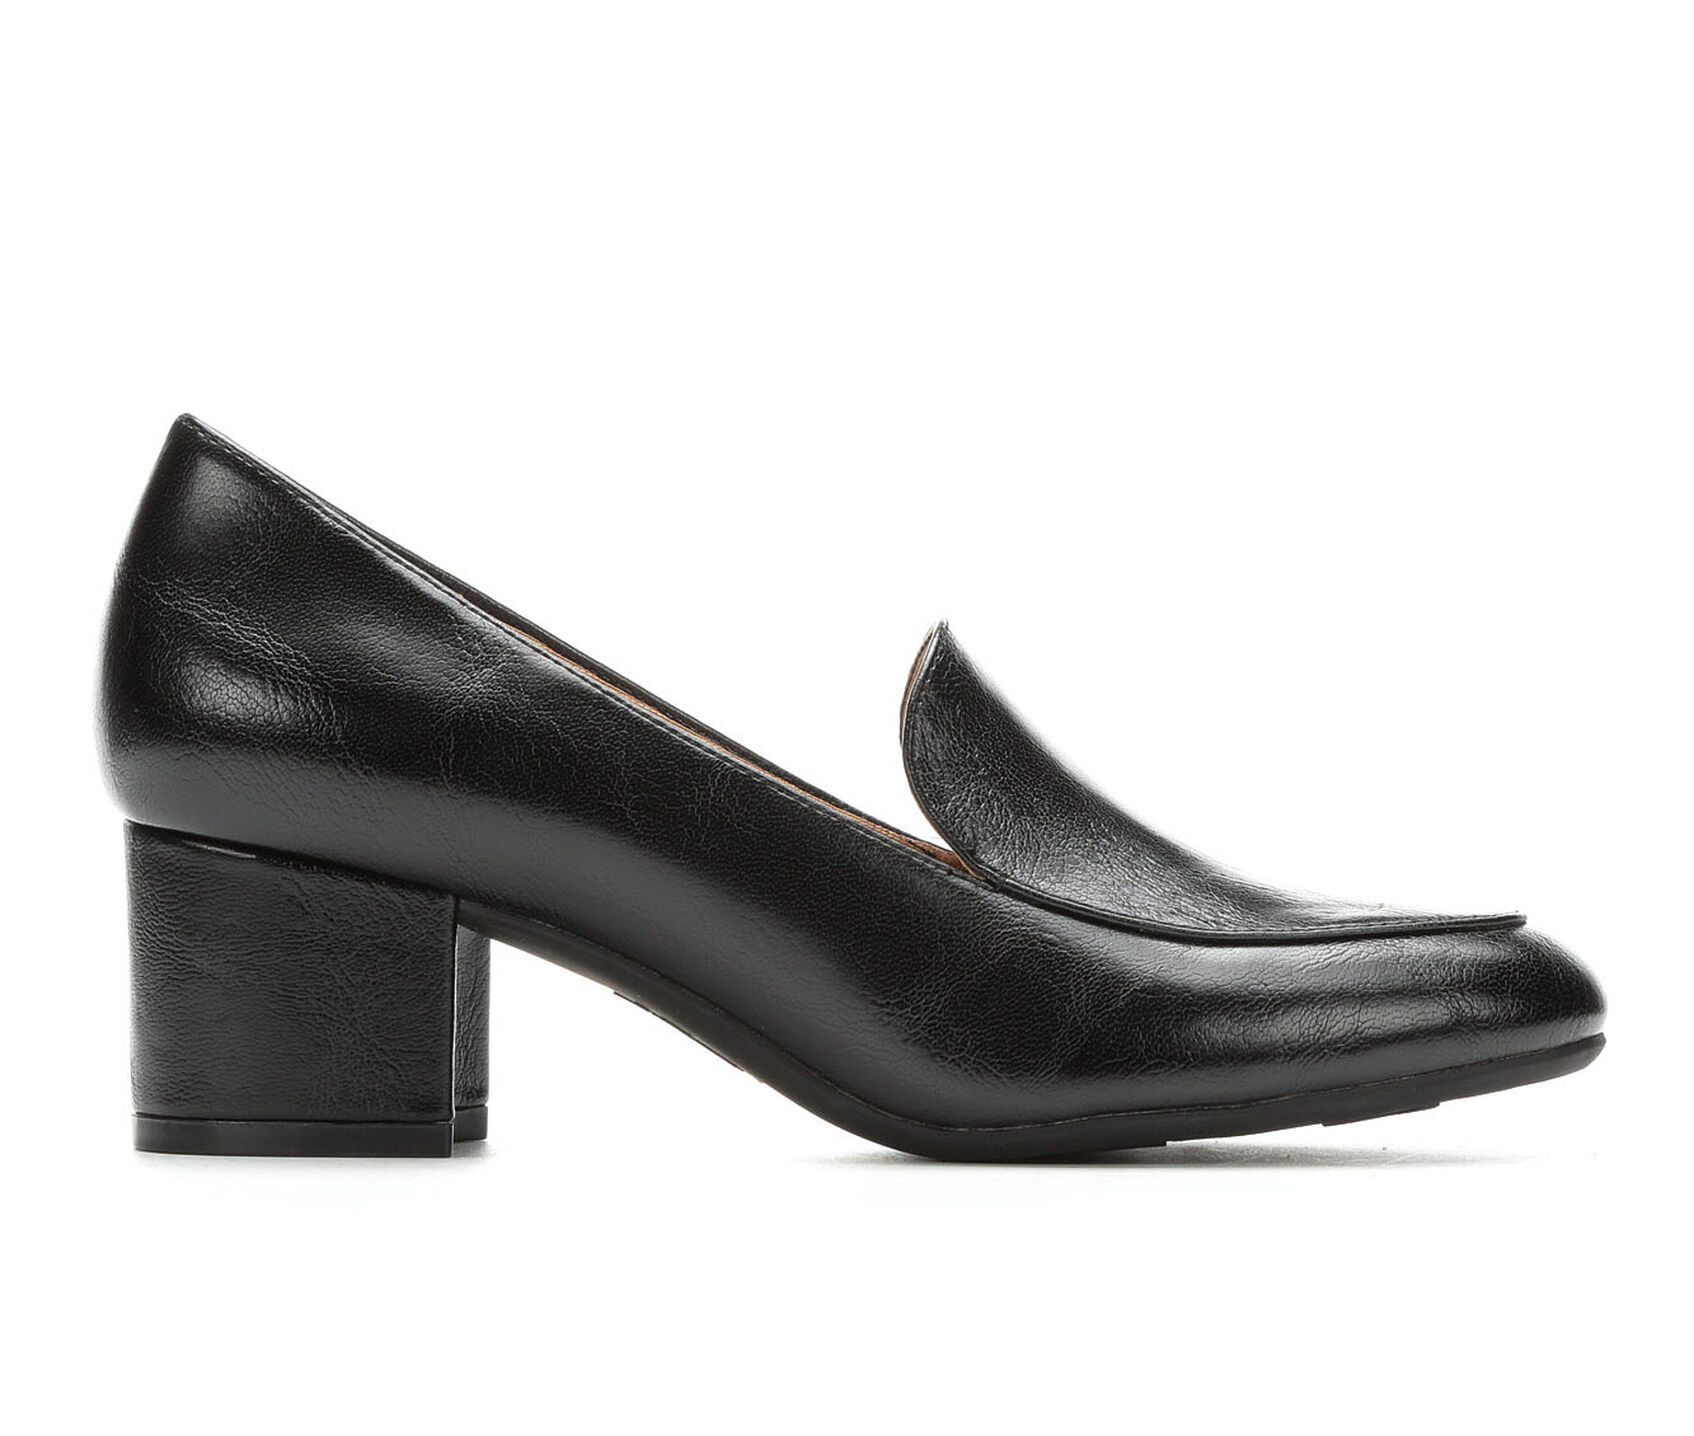 203a7cb9081 Women s LifeStride Trixie Shoes